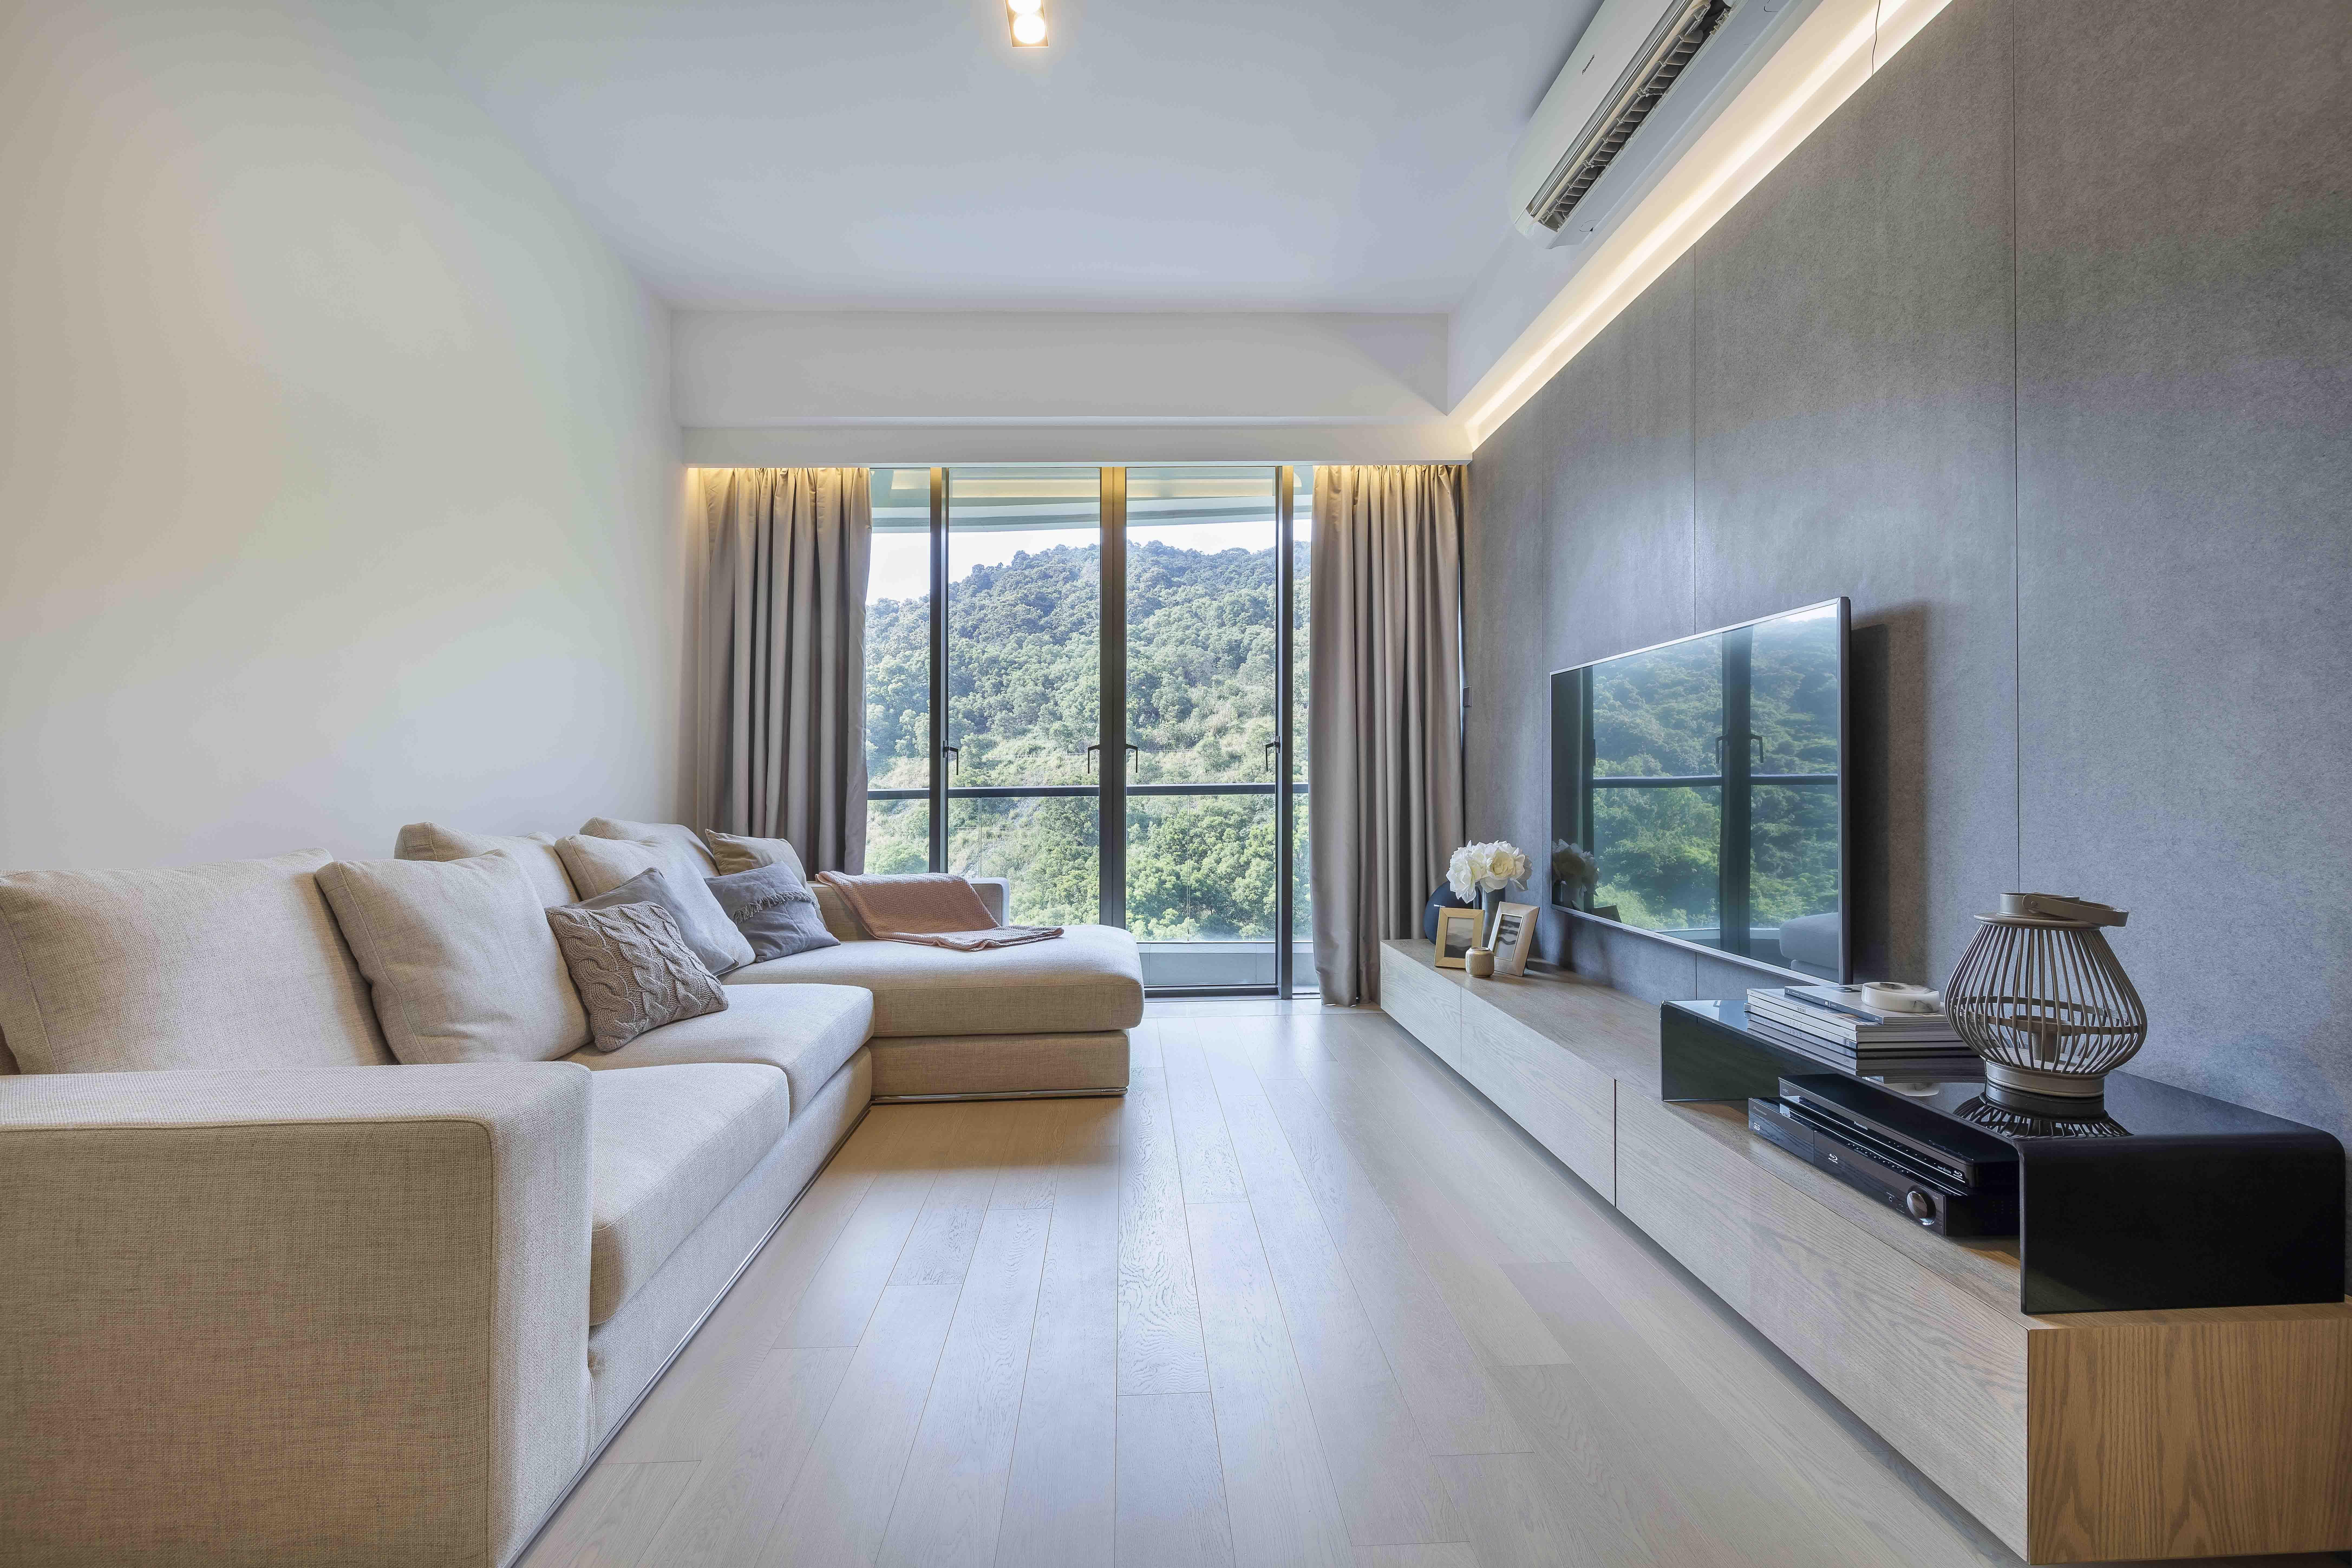 urban house furniture. Studio Adjective #living #urban #balcony #interior #design #sofa #family Urban House Furniture